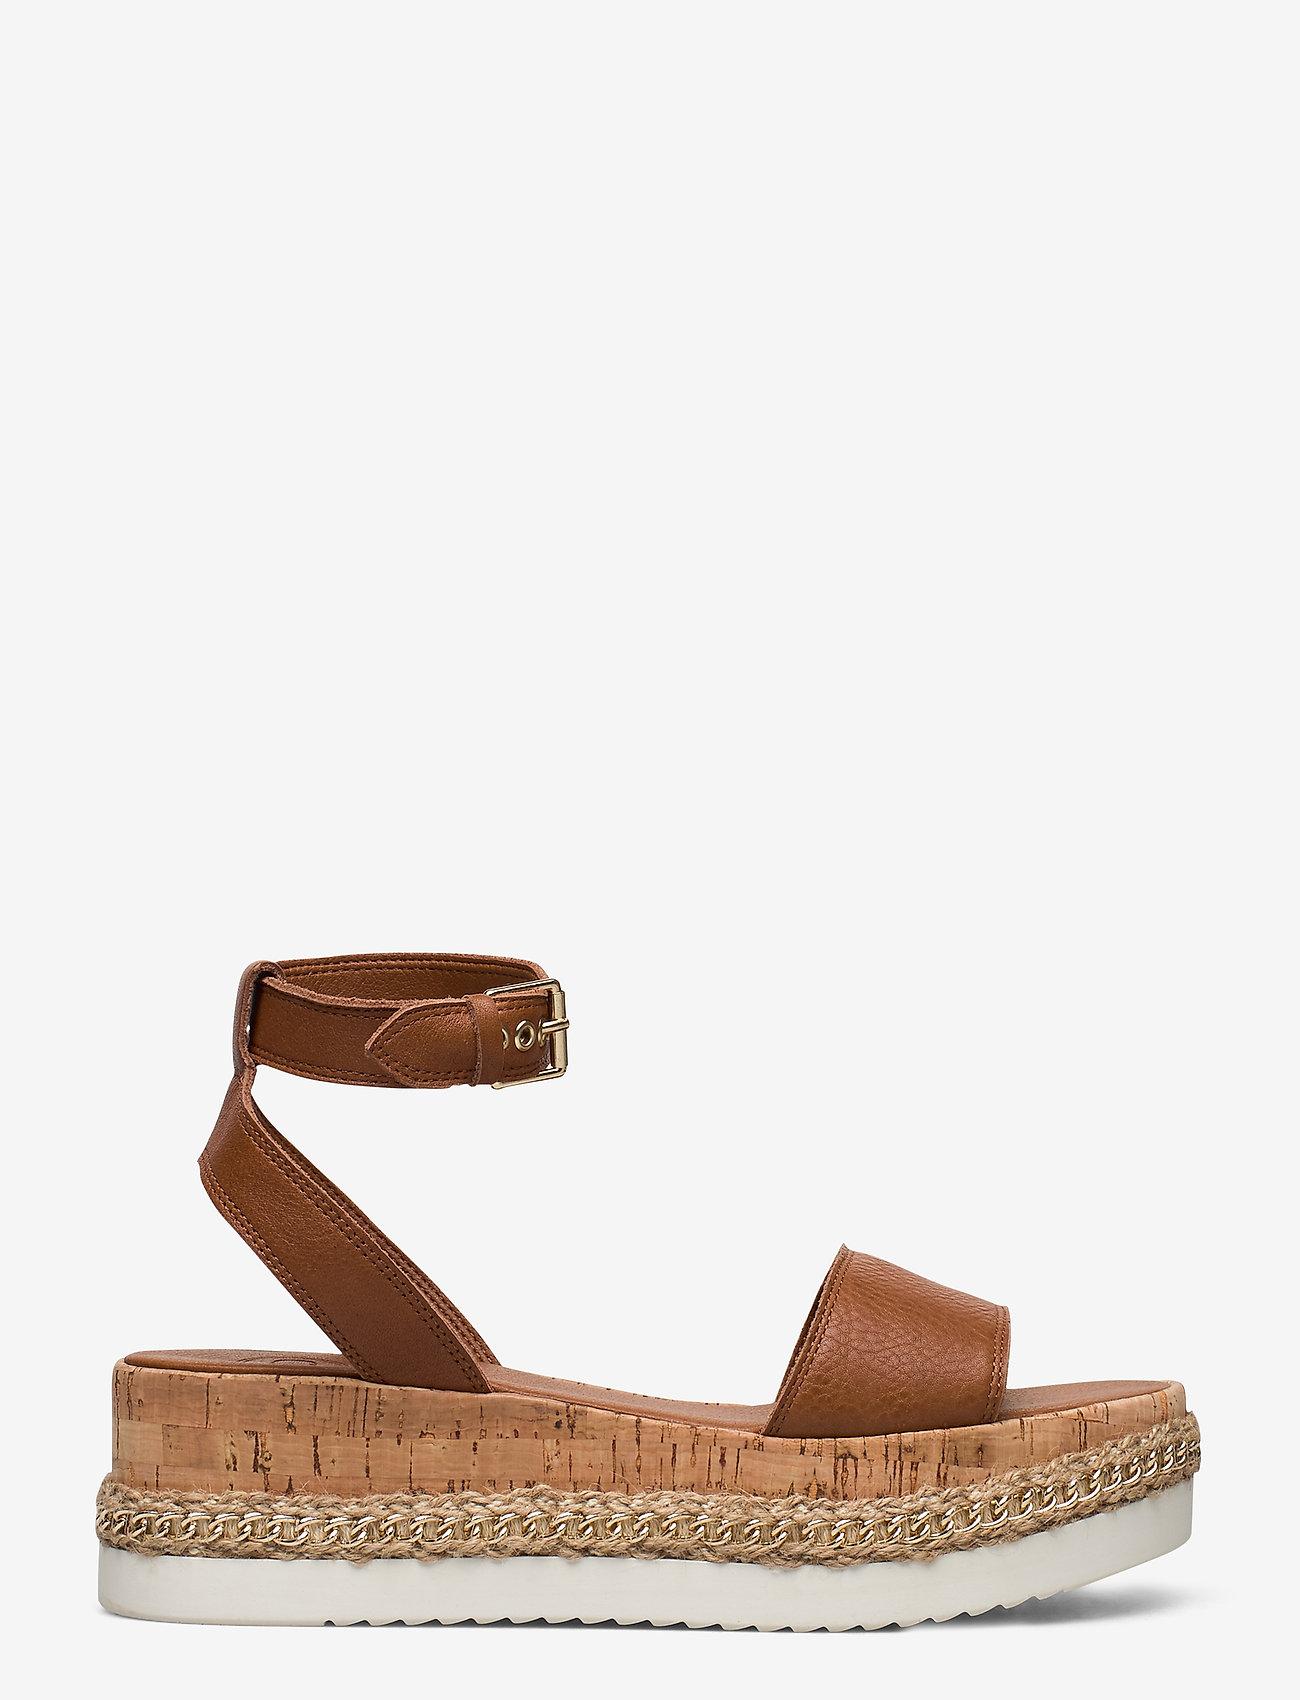 Dune London Krest - Heeled Shoes